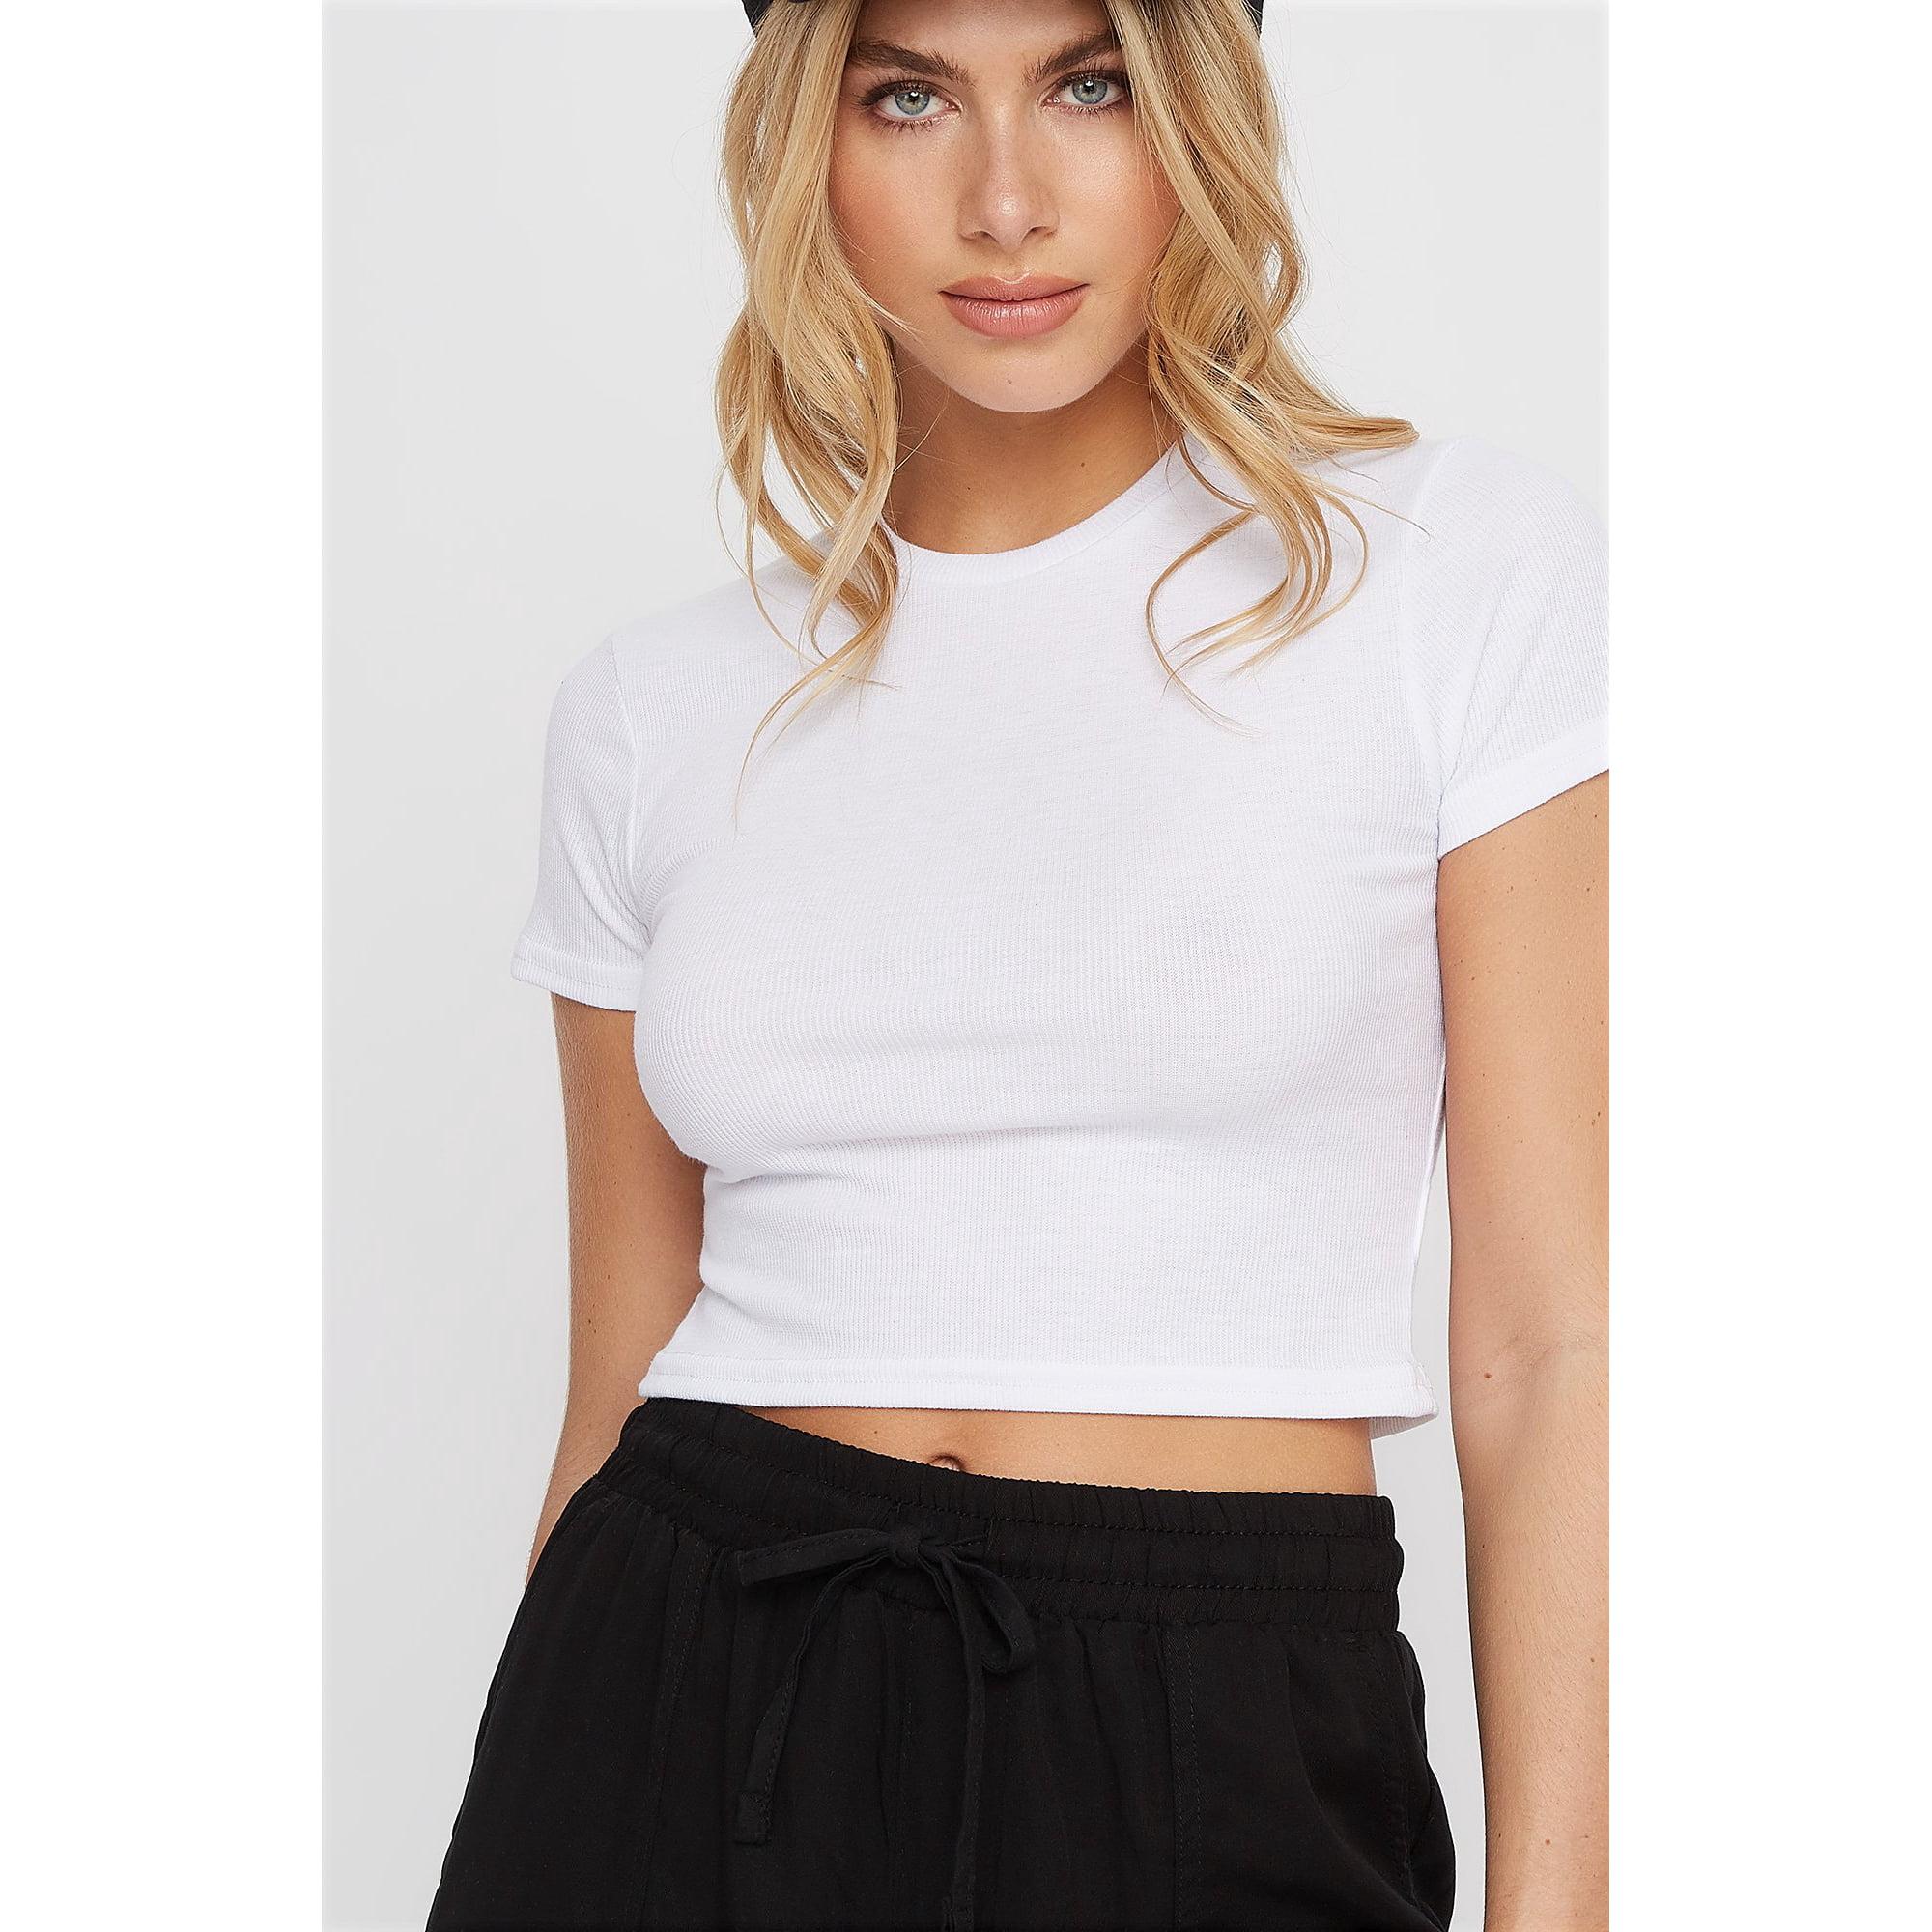 32645f59 Urban Planet Women's Ribbed Crew Neck Cropped T-Shirt | Walmart Canada